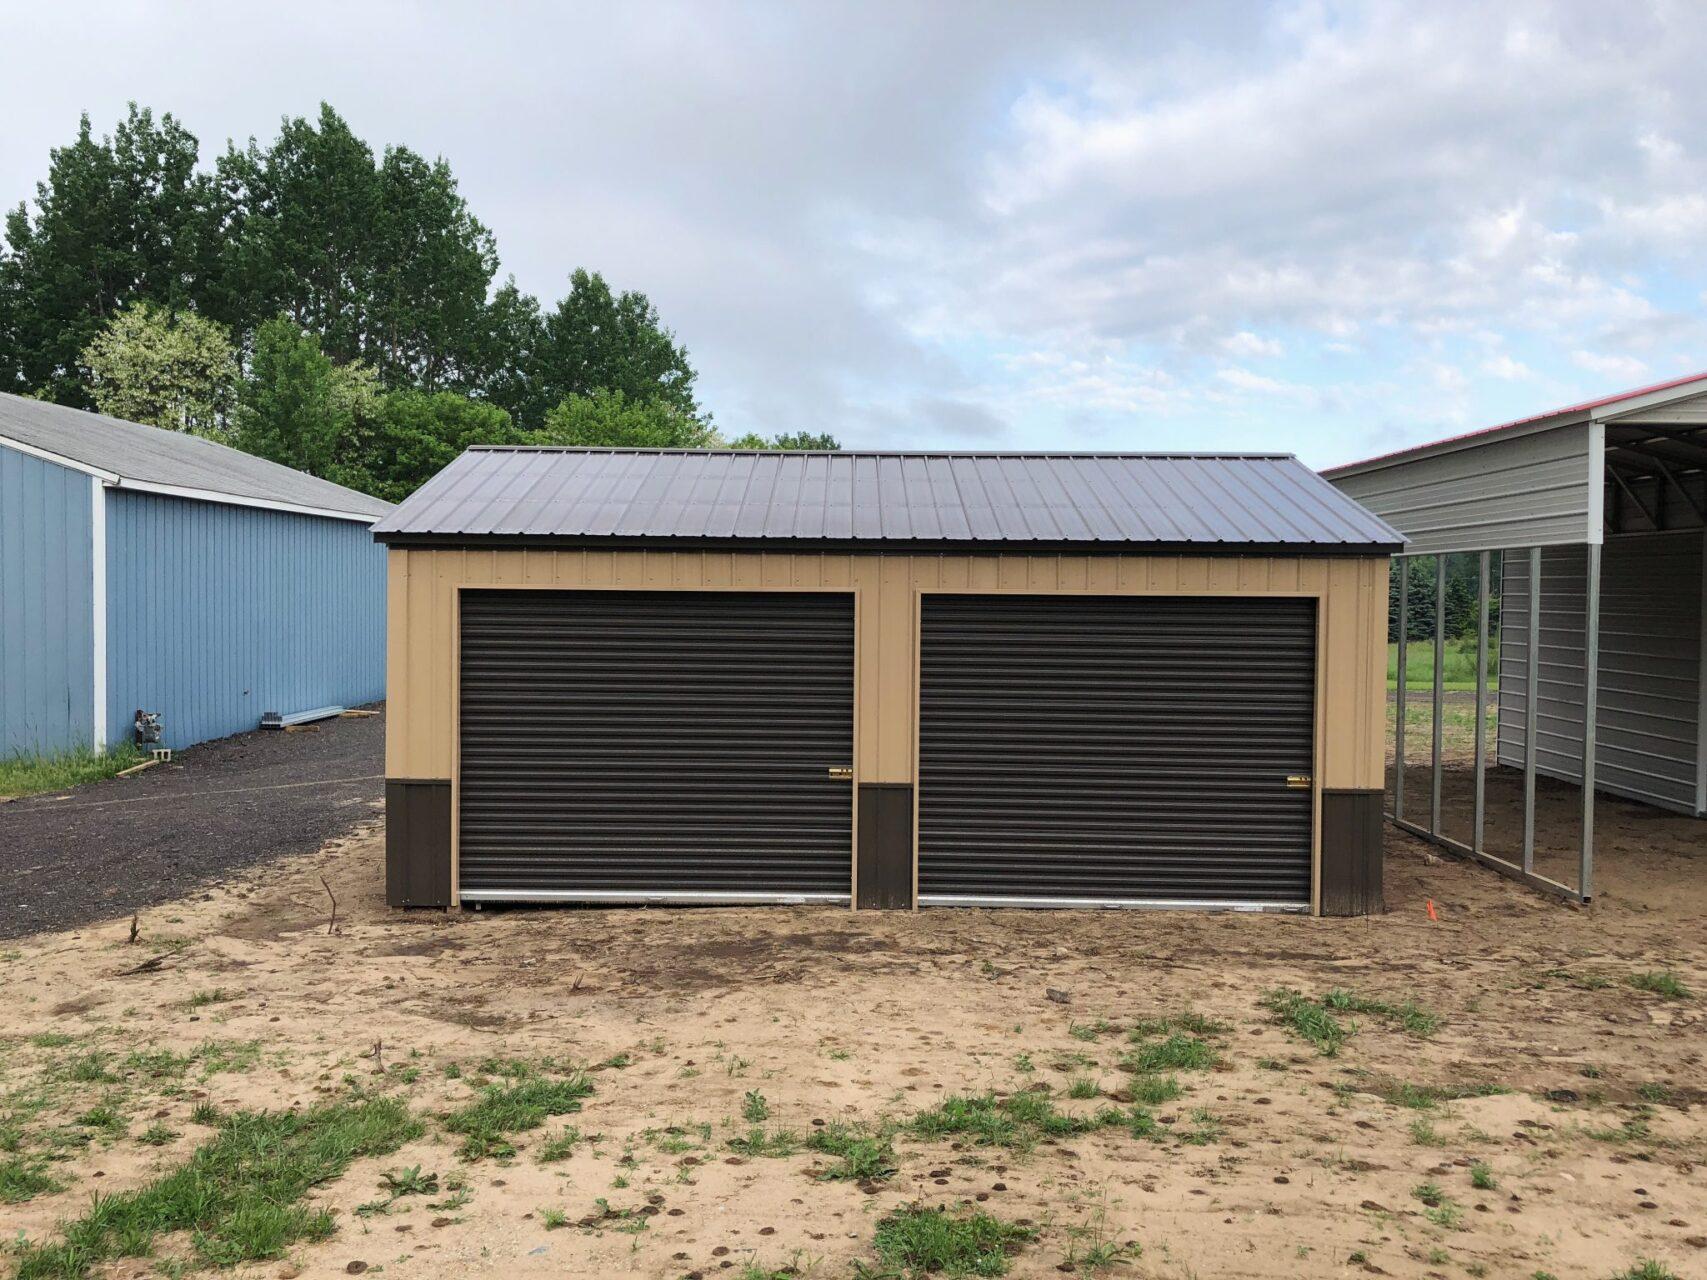 18x25x9 All Steel Garage in Grant, Michigan